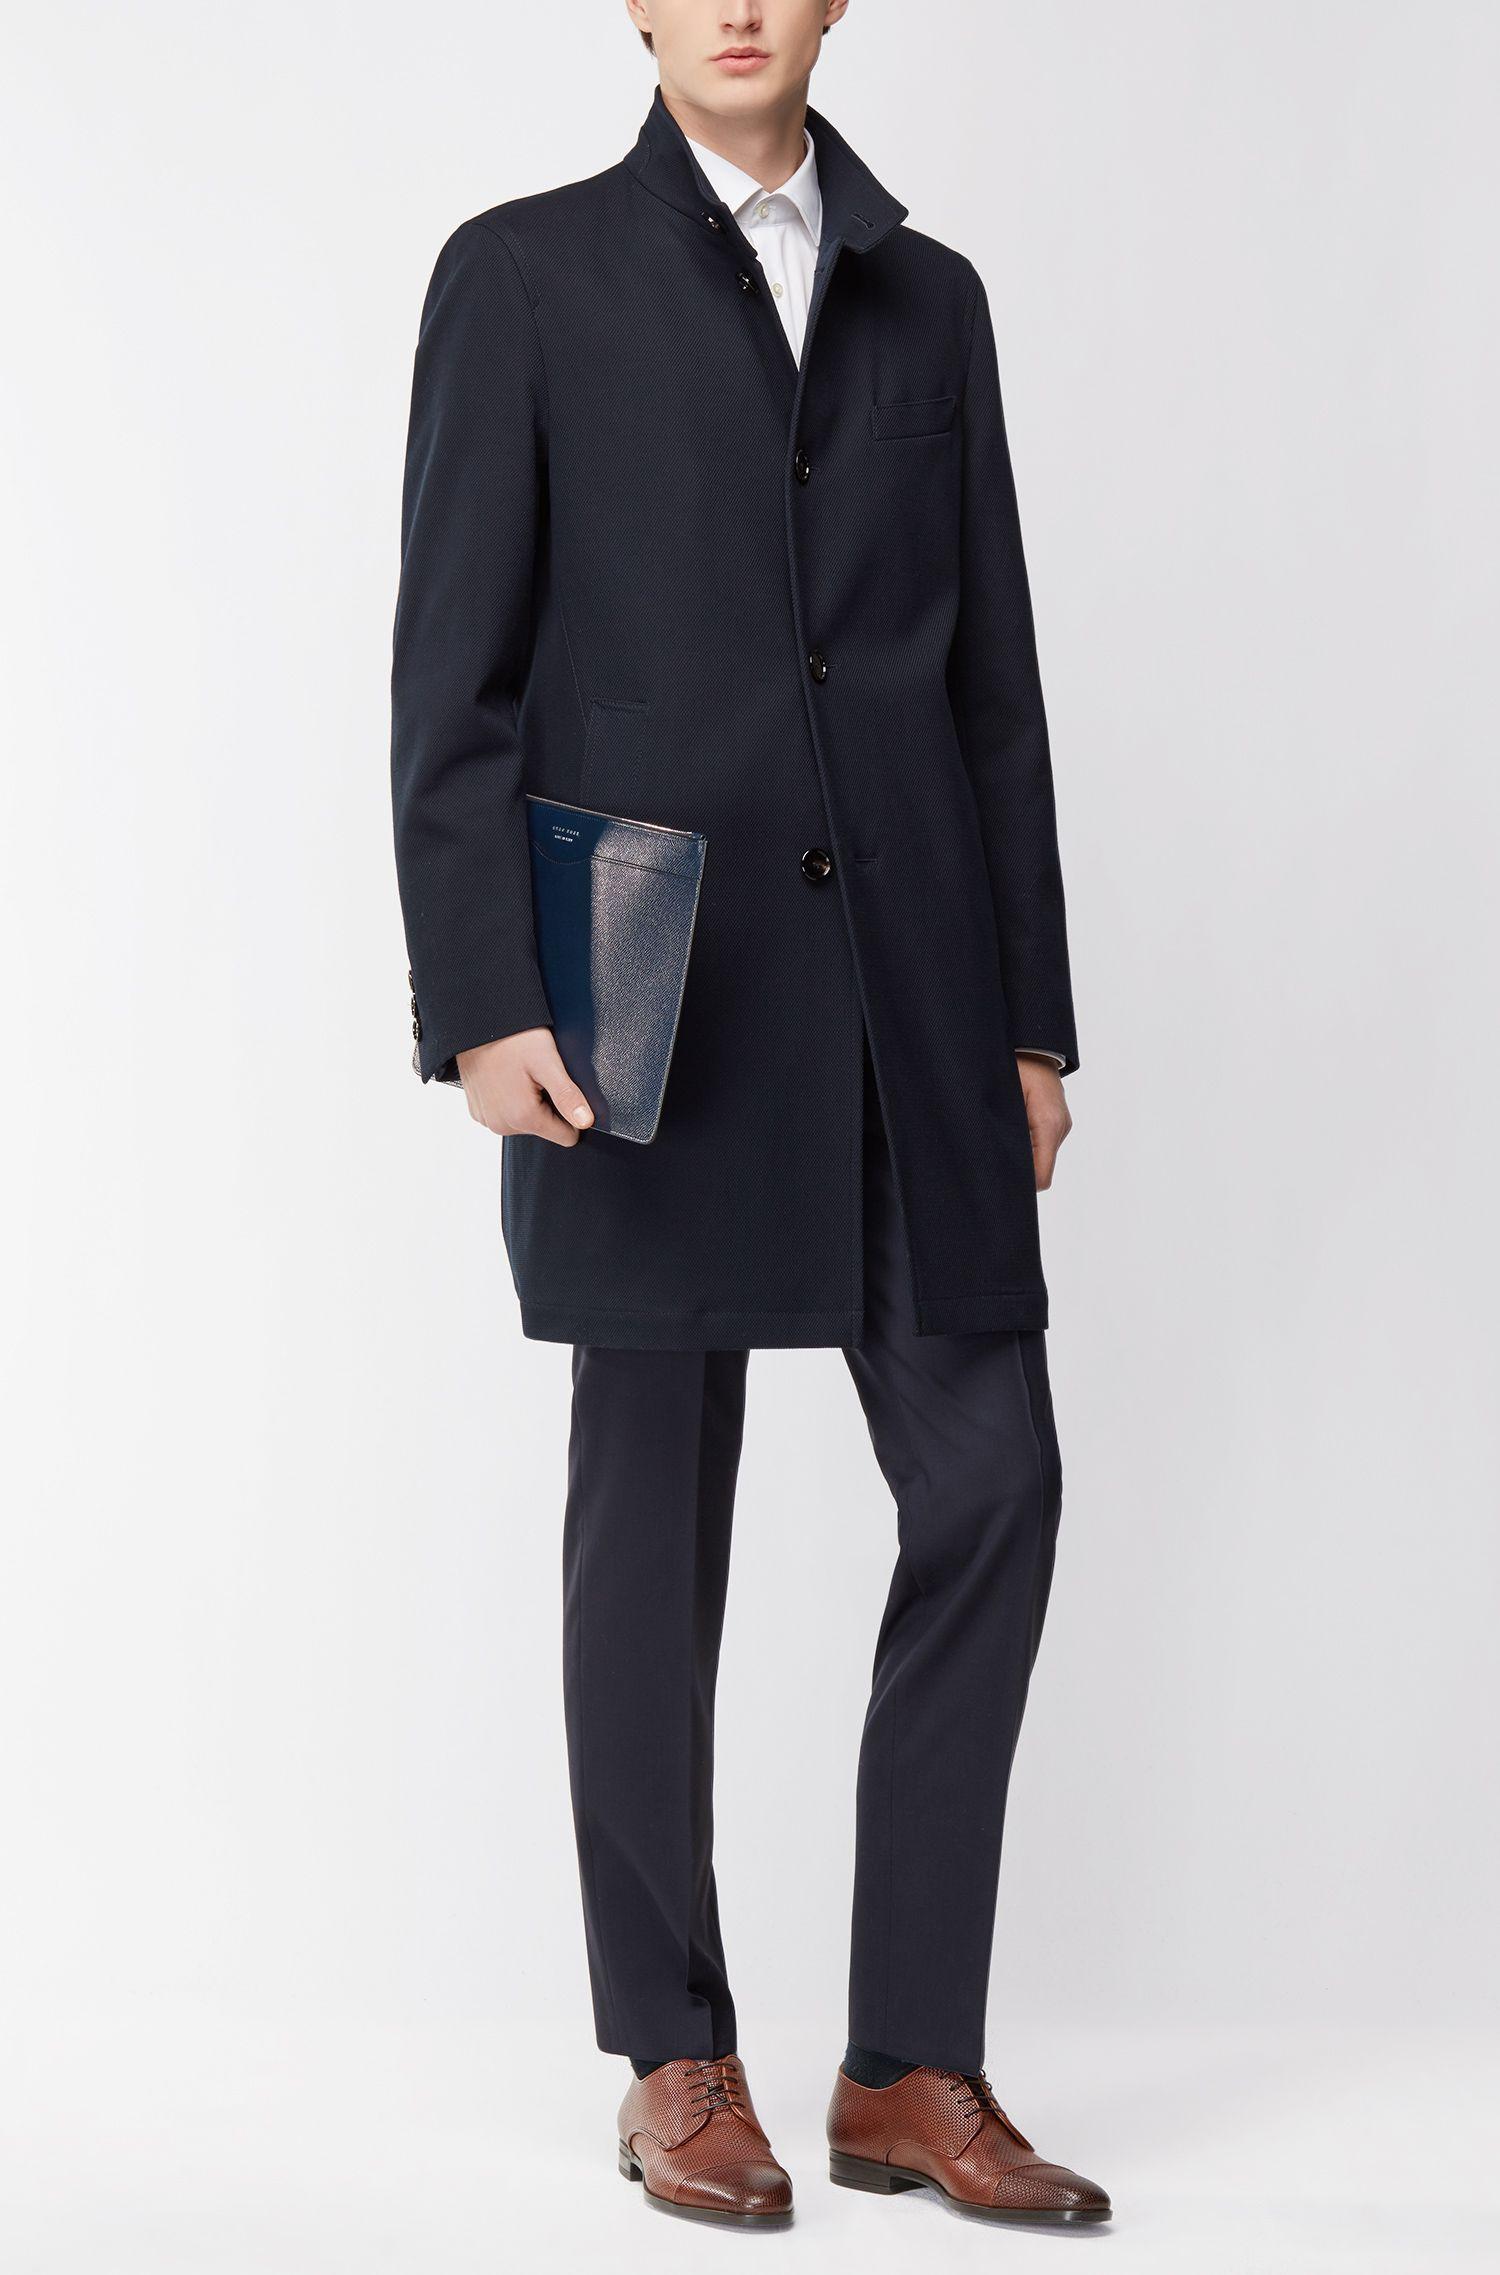 Embossed Leather Derby Shoe | Kensington Derb, Brown